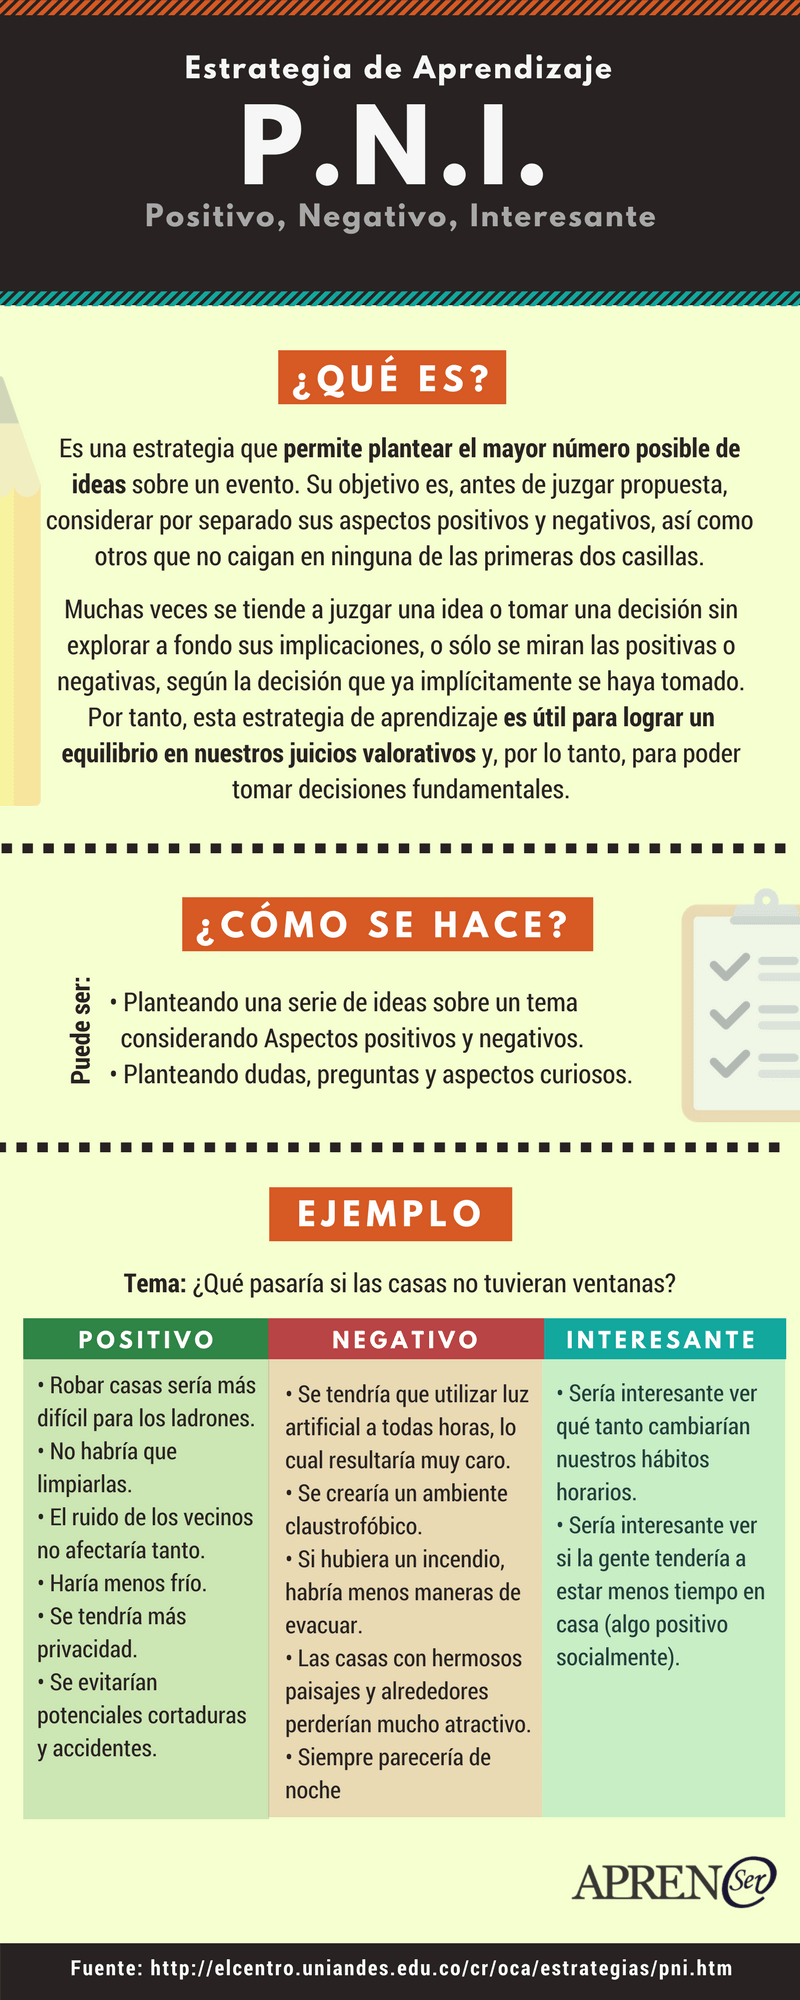 Estrategia De Aprendizaje Pni  Positivo  Negativo  Interesante    Aprensernet  Formaciononline